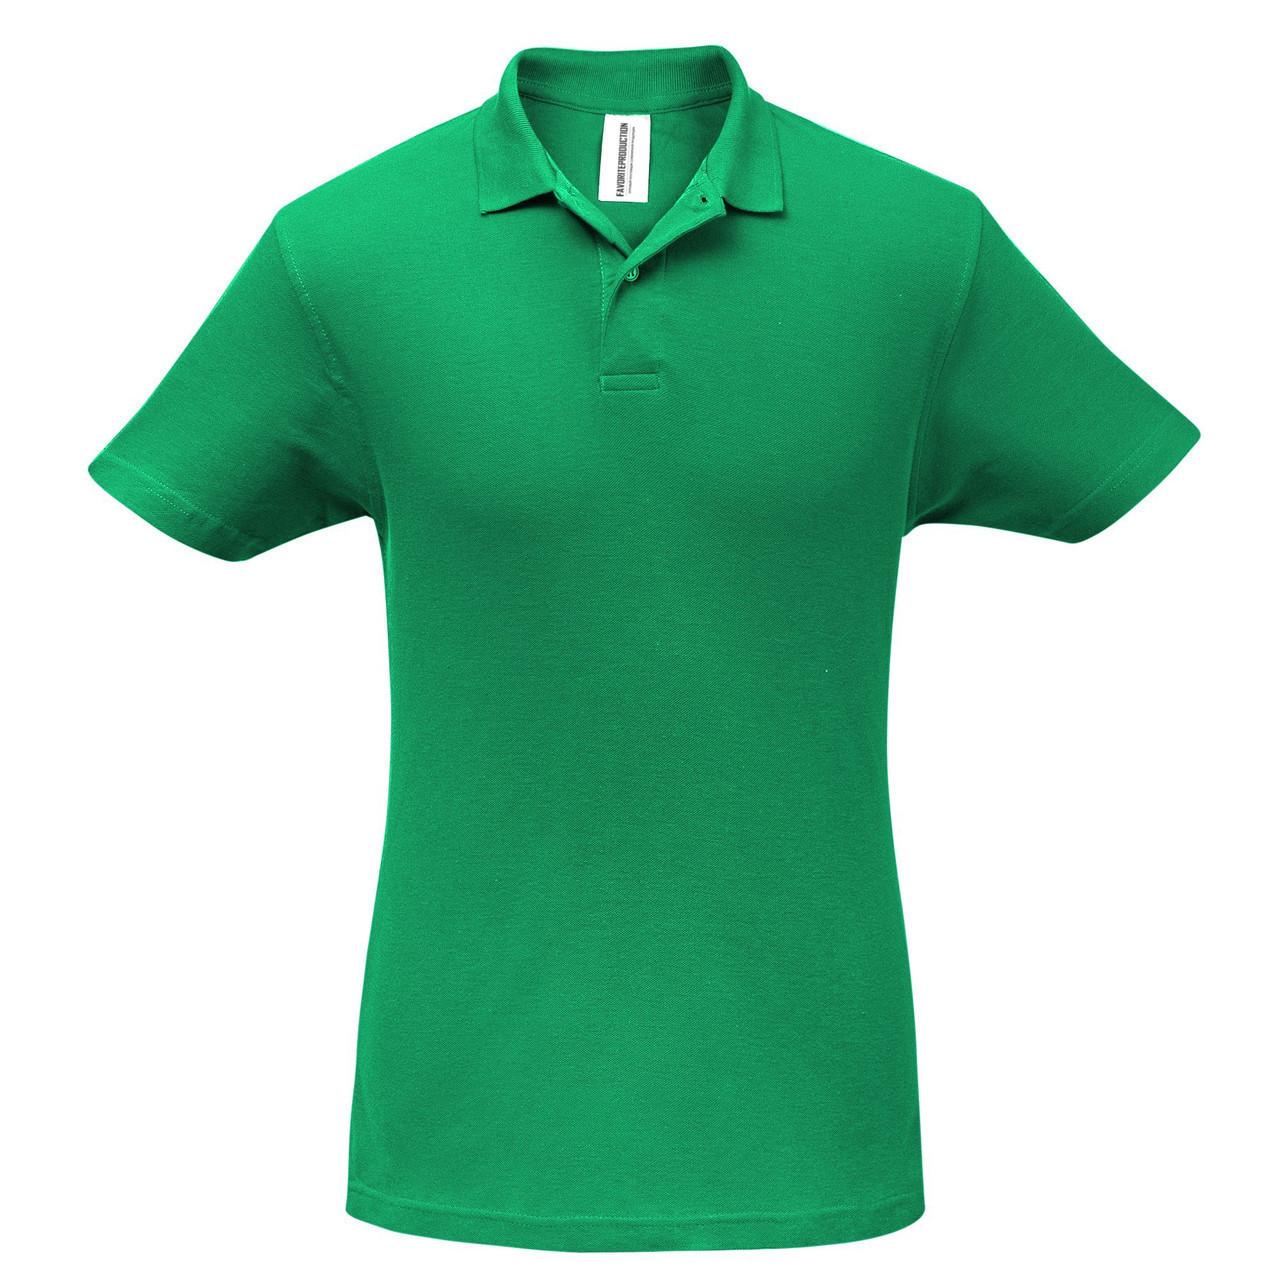 Футболка Поло Зеленая.200 гр.XL